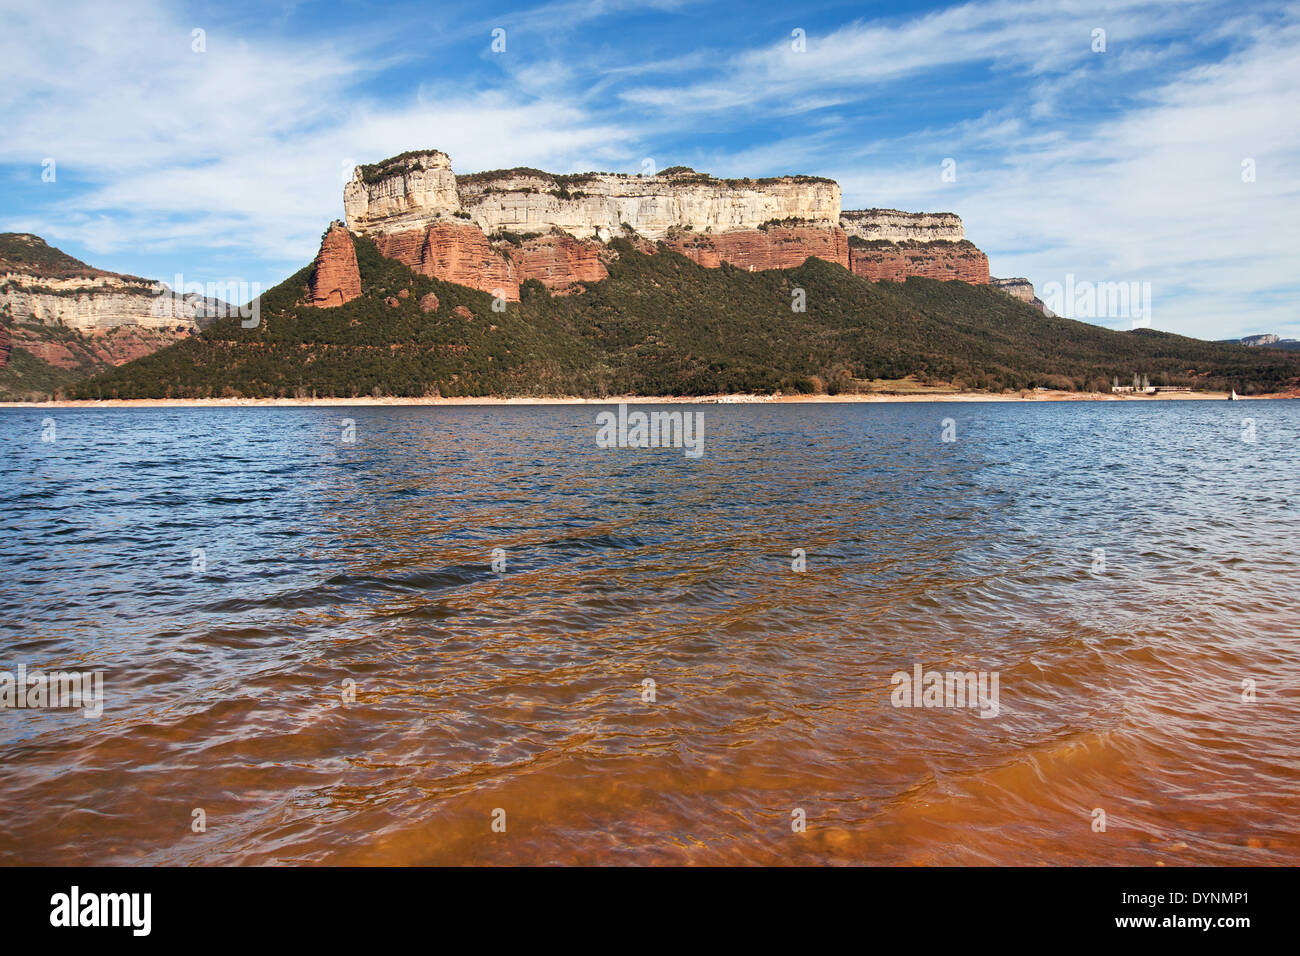 Sau Reservoir and Tavertet Cliffs, Barcelona province, Catalonia. - Stock Image